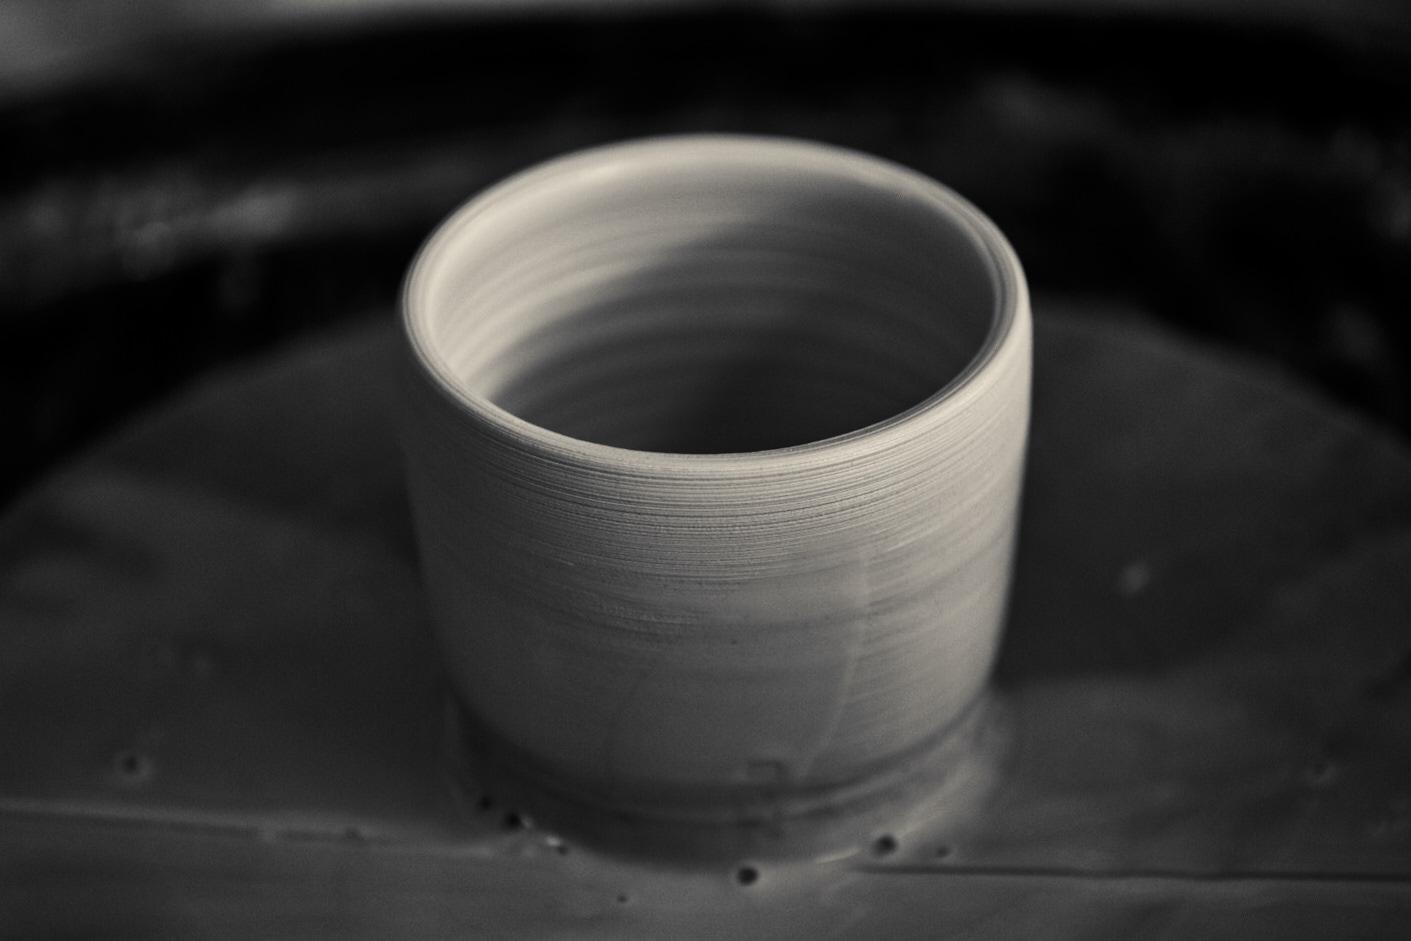 170610 Mum Pottery 200.jpg